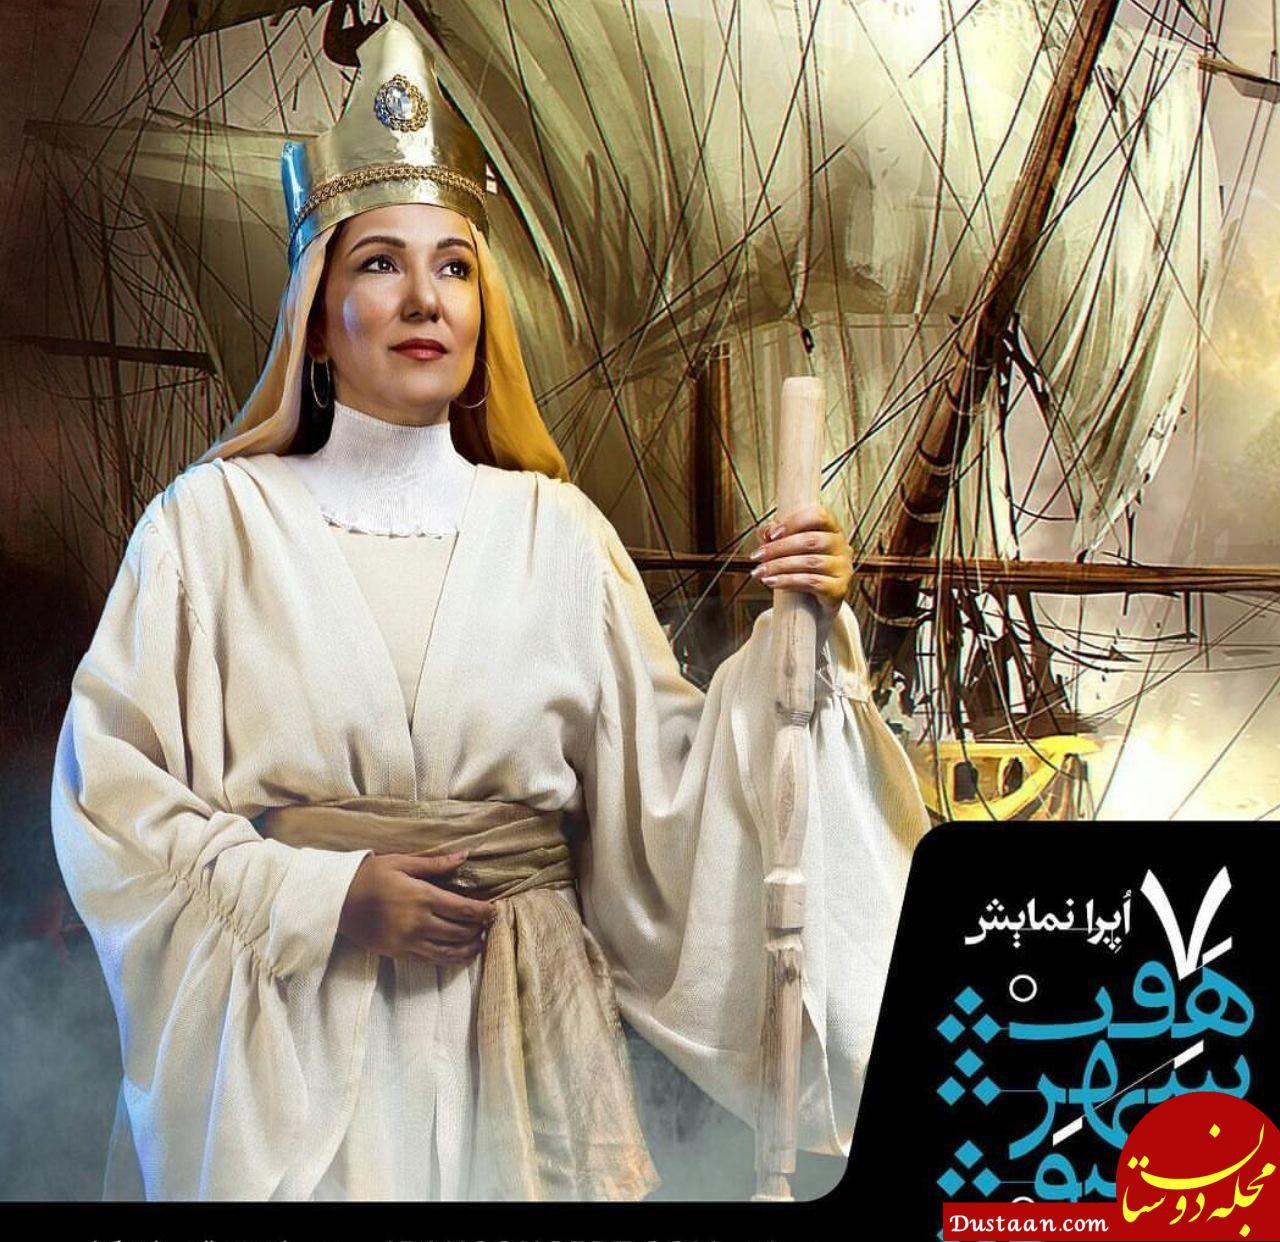 www.dustaan.com گریم دیدنی پانته آ بهرام در اپرا   نمایش هفت شهر عشق